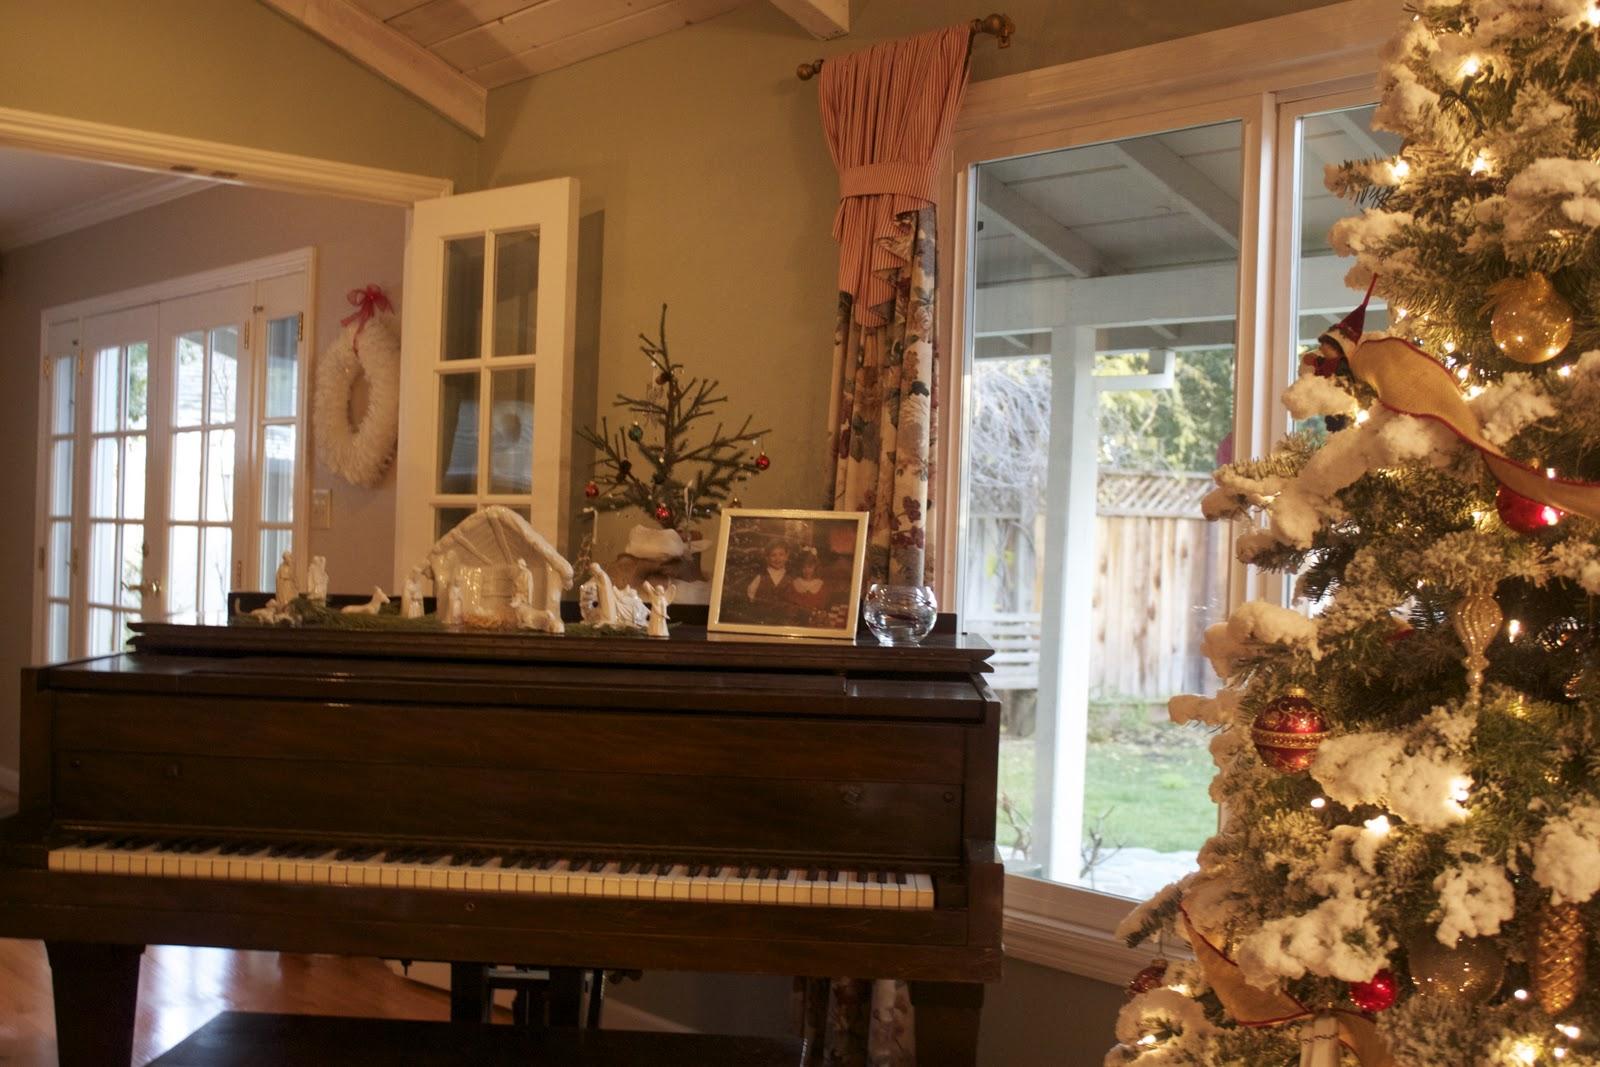 Holiday Decor Christmas Cheer Link Up Michaela Noelle